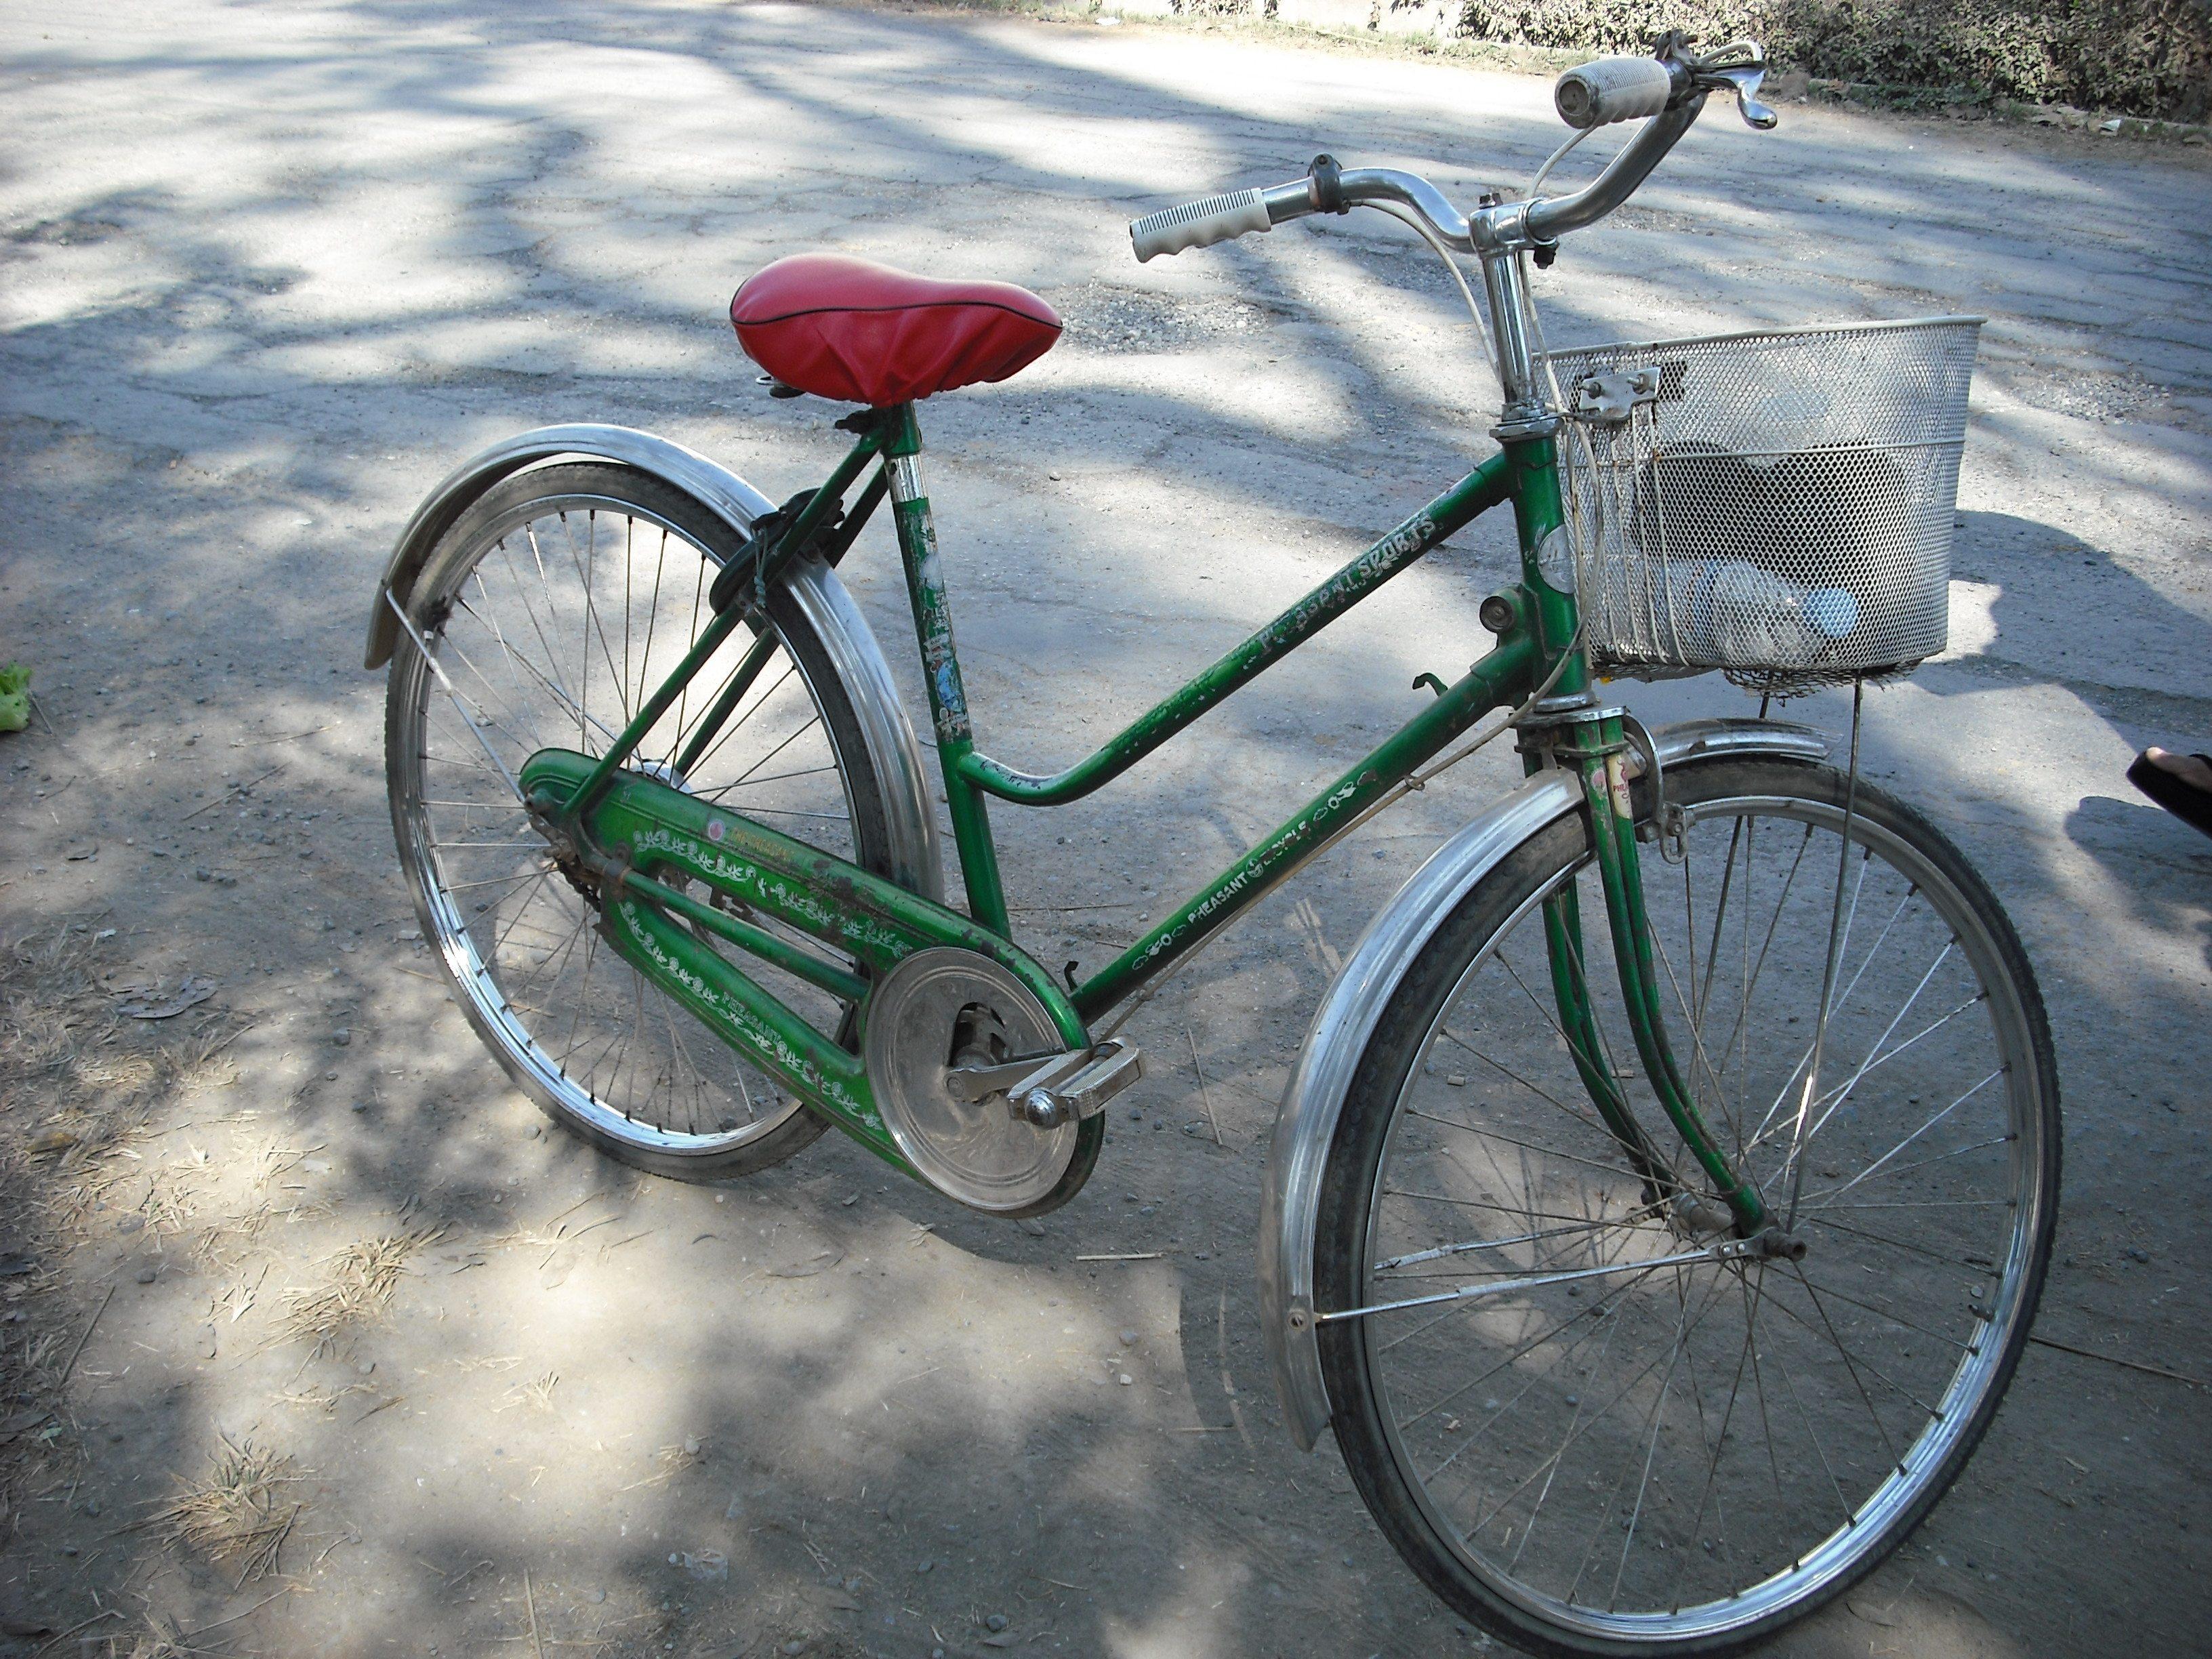 bike in BUrma